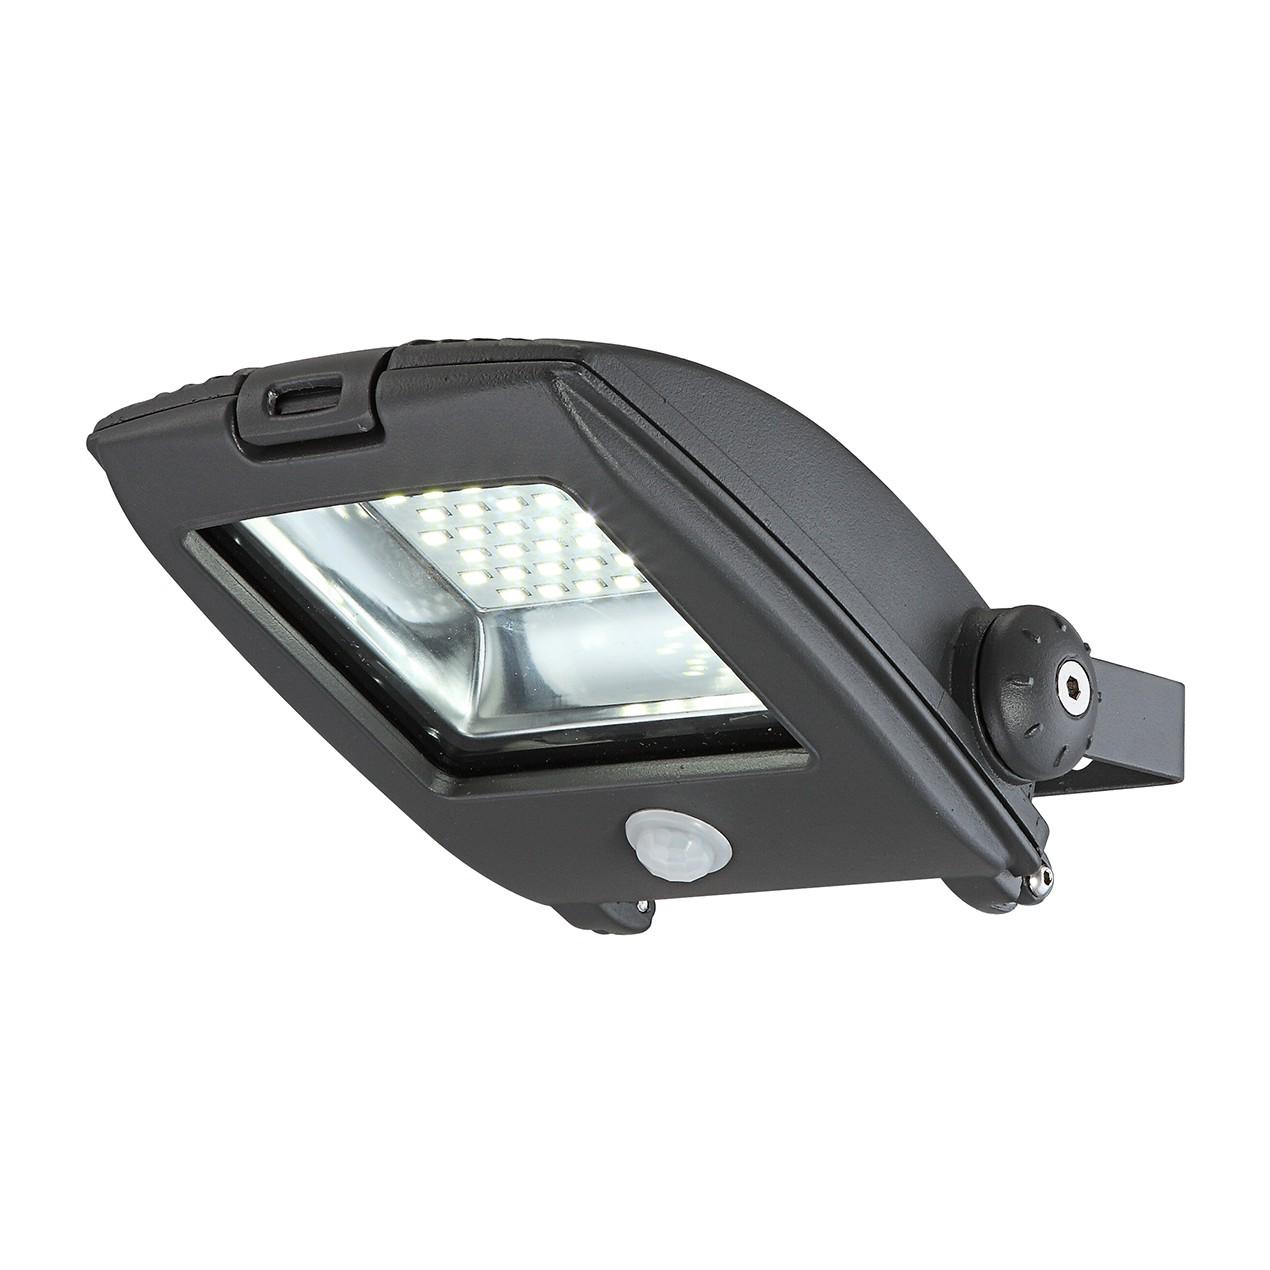 LED-Baustrahler Projecteur II 1-flammig ● Grau Aluminium- Druckguss- Globo Lighting A+